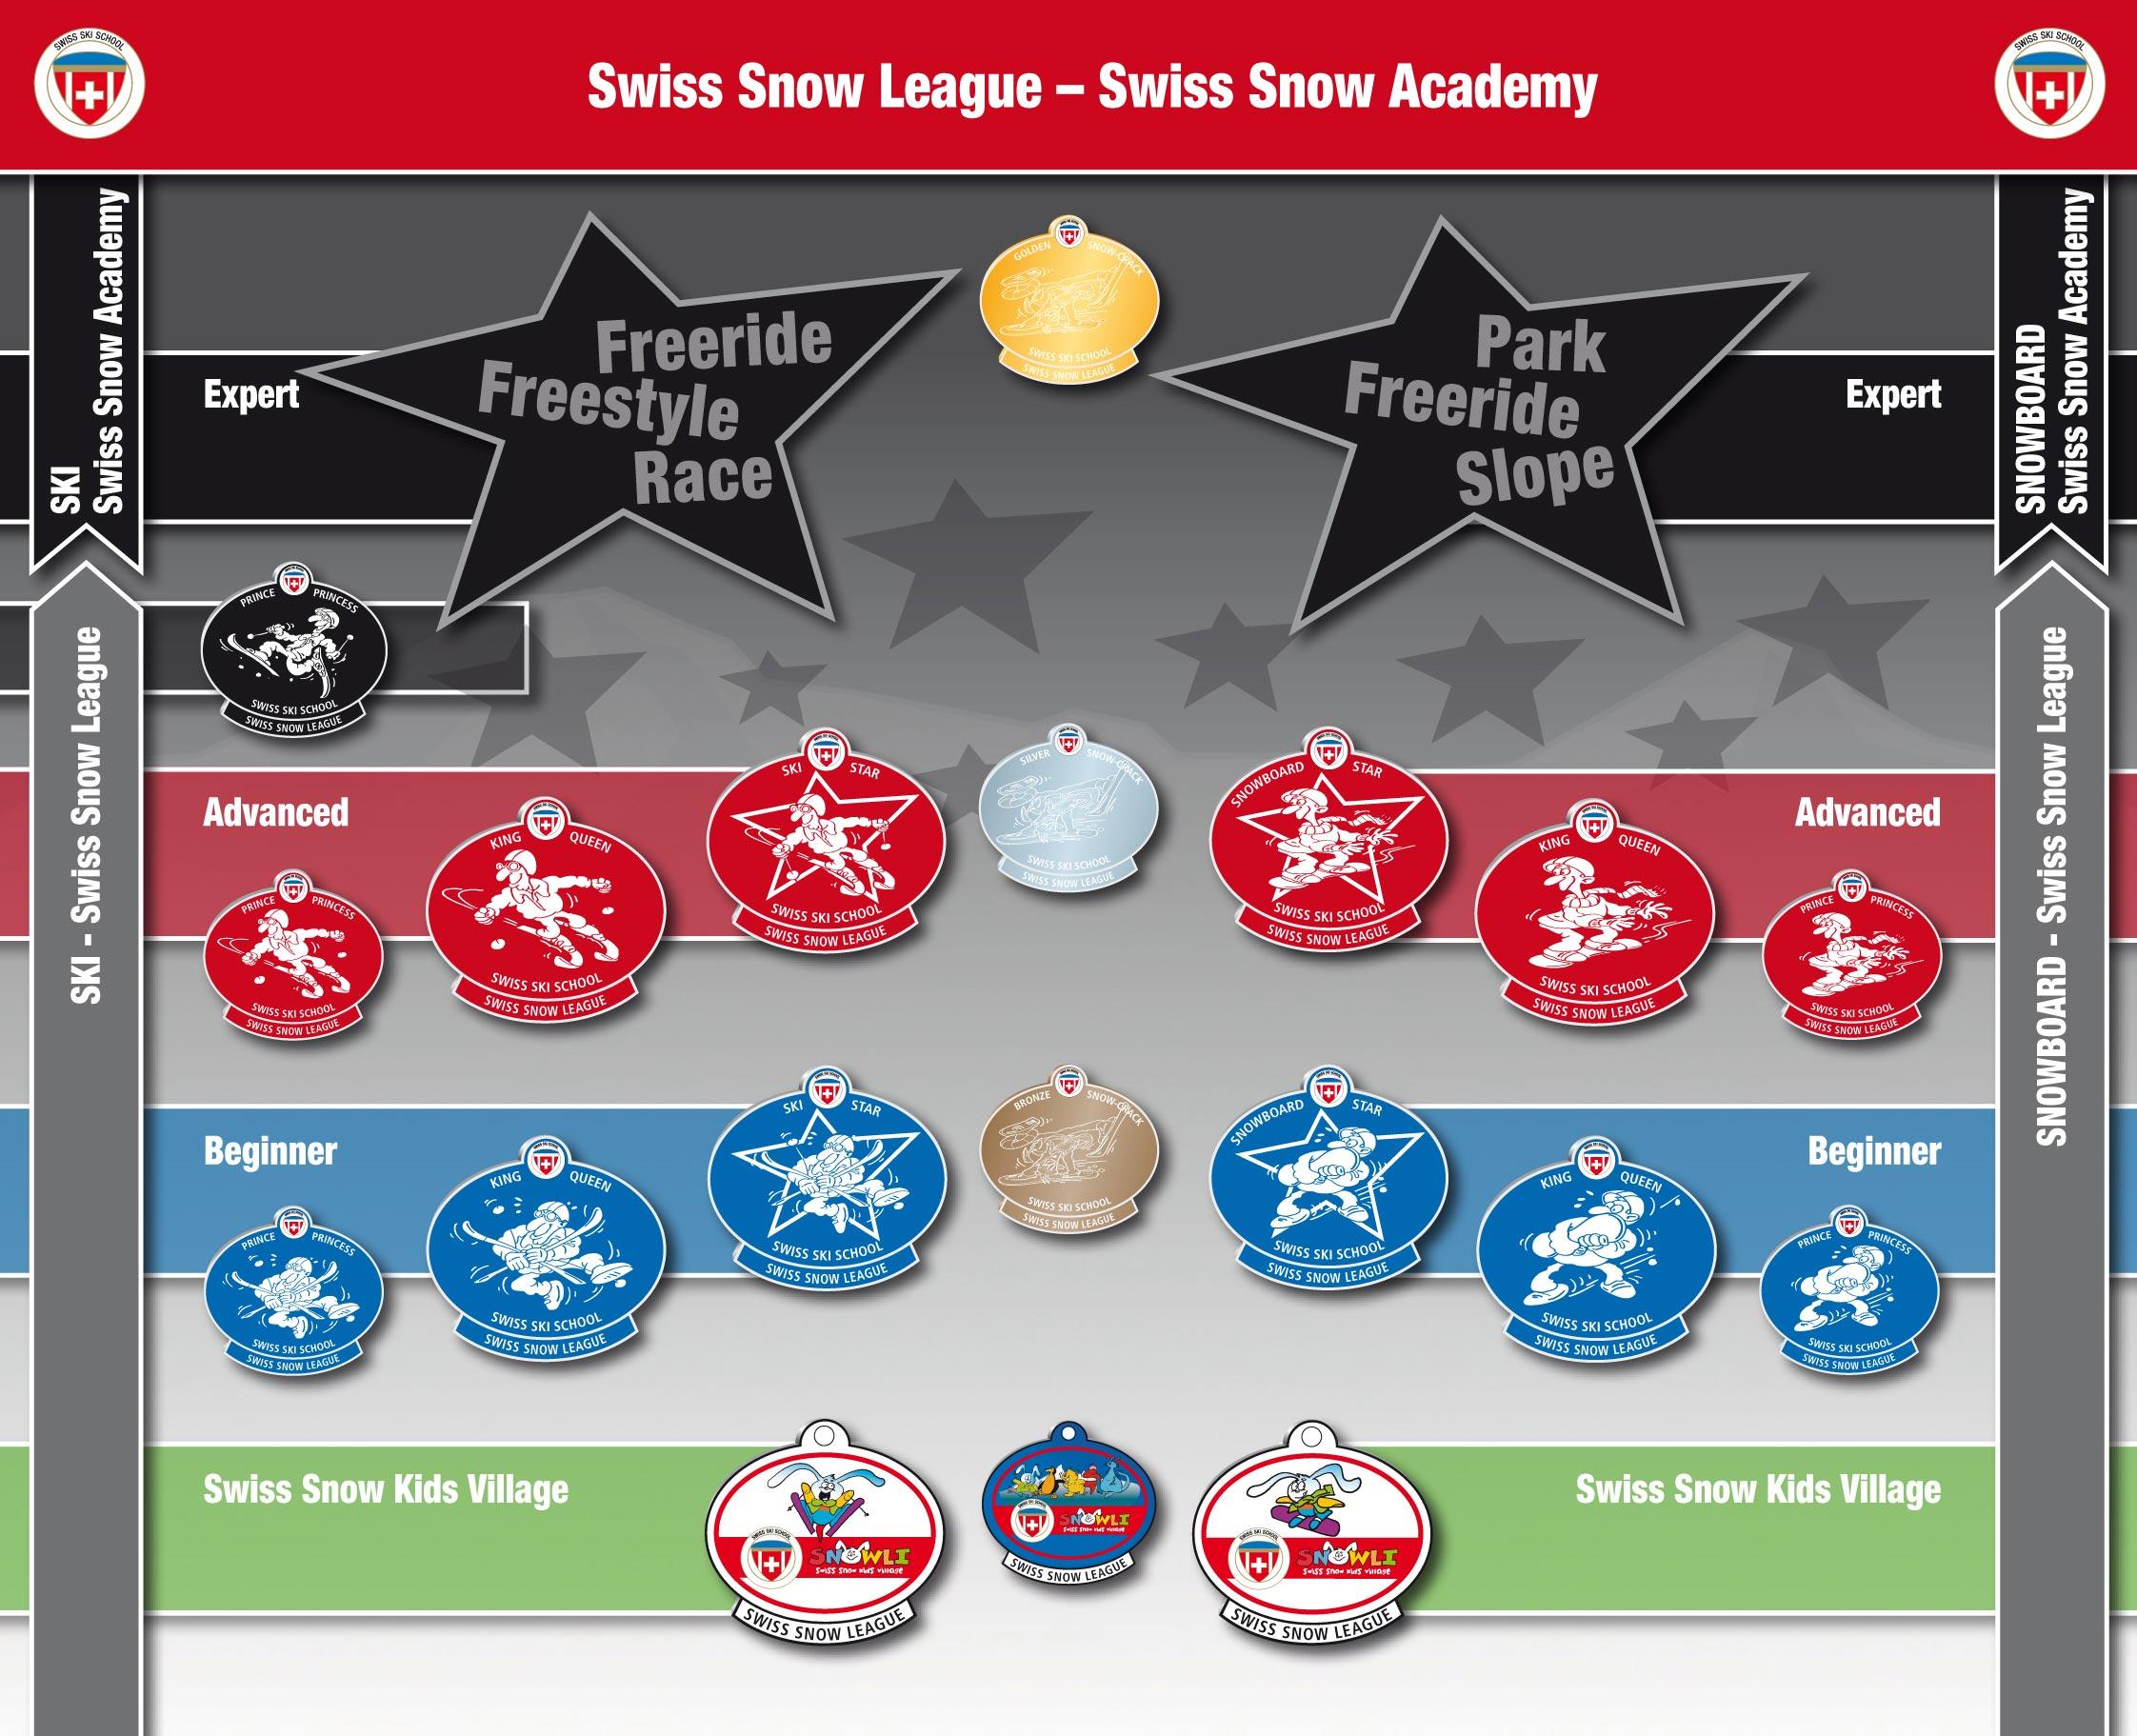 Overview Swiss Snow League